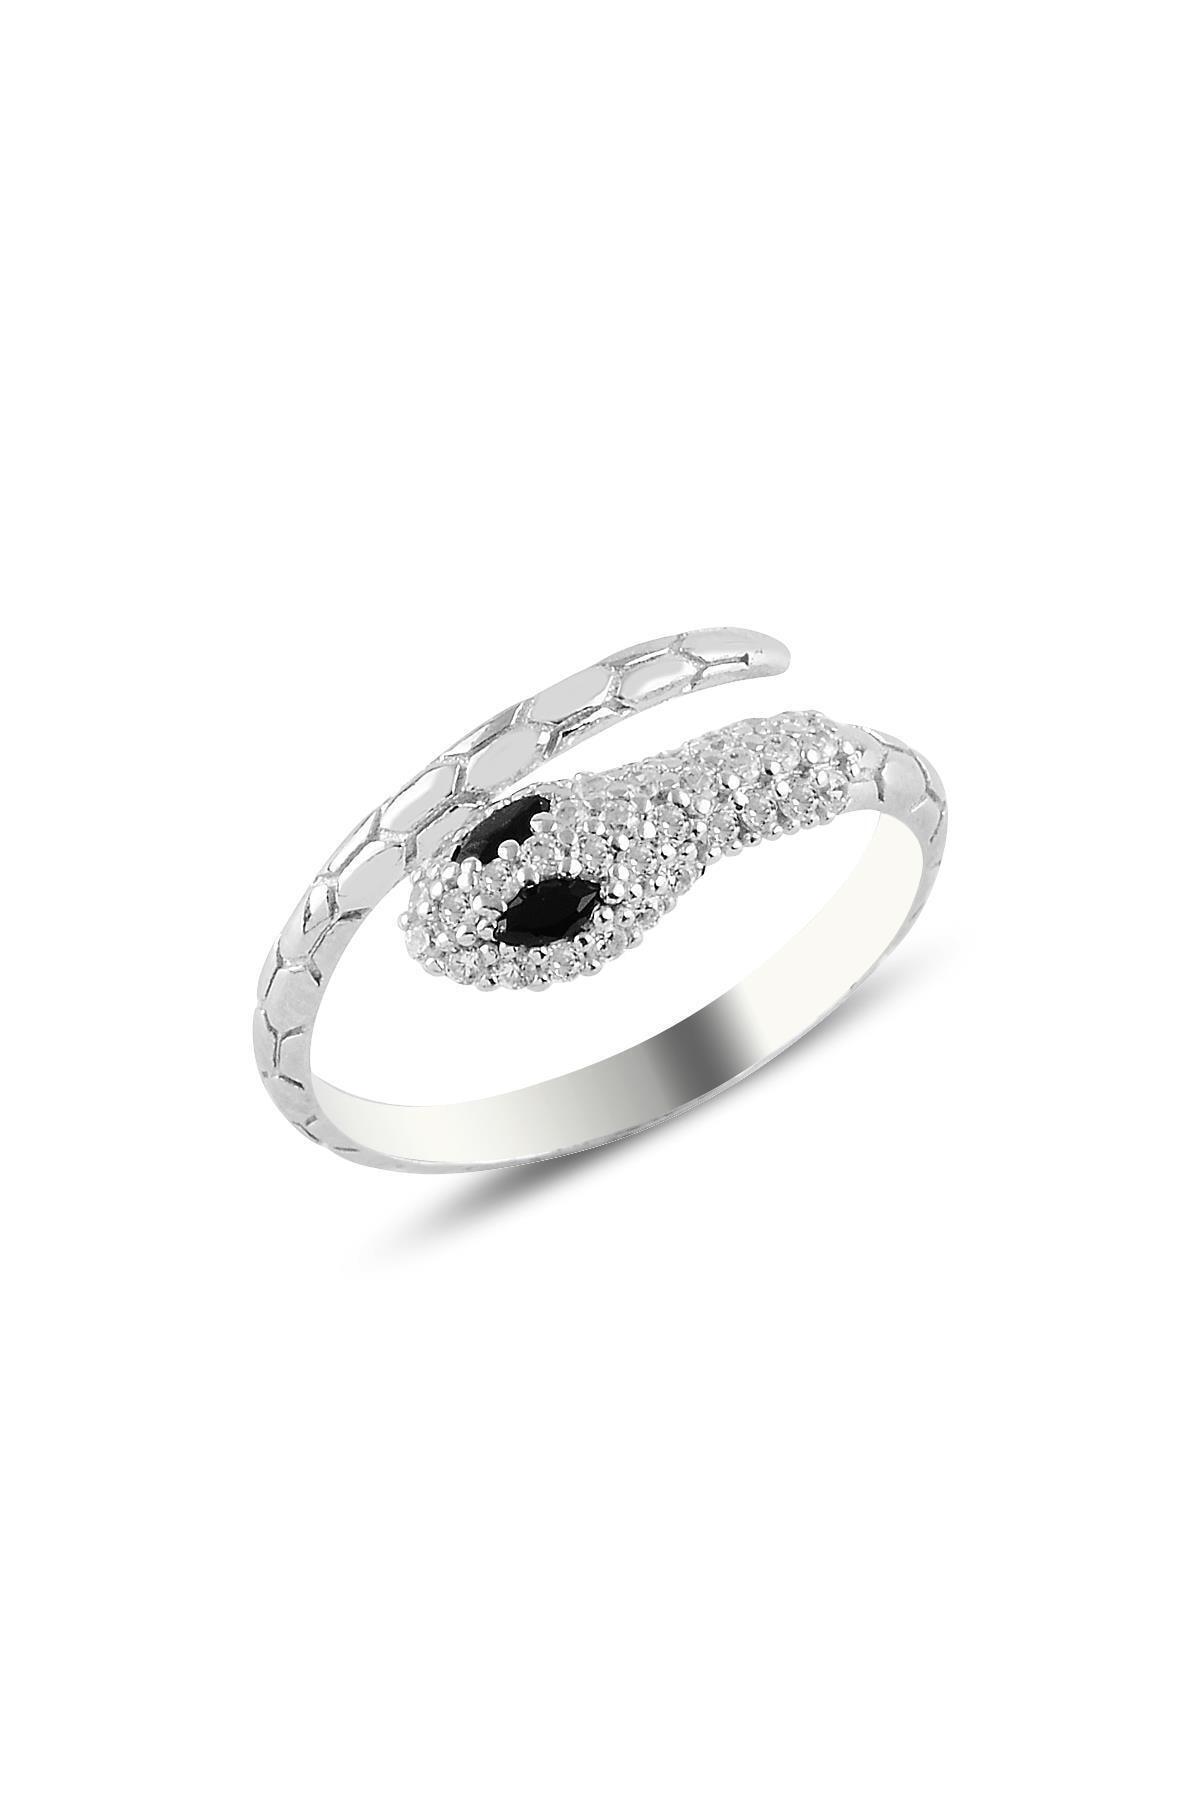 انگشتر زنانه خاص برند Söğütlü Silver رنگ مشکی کد ty89651905